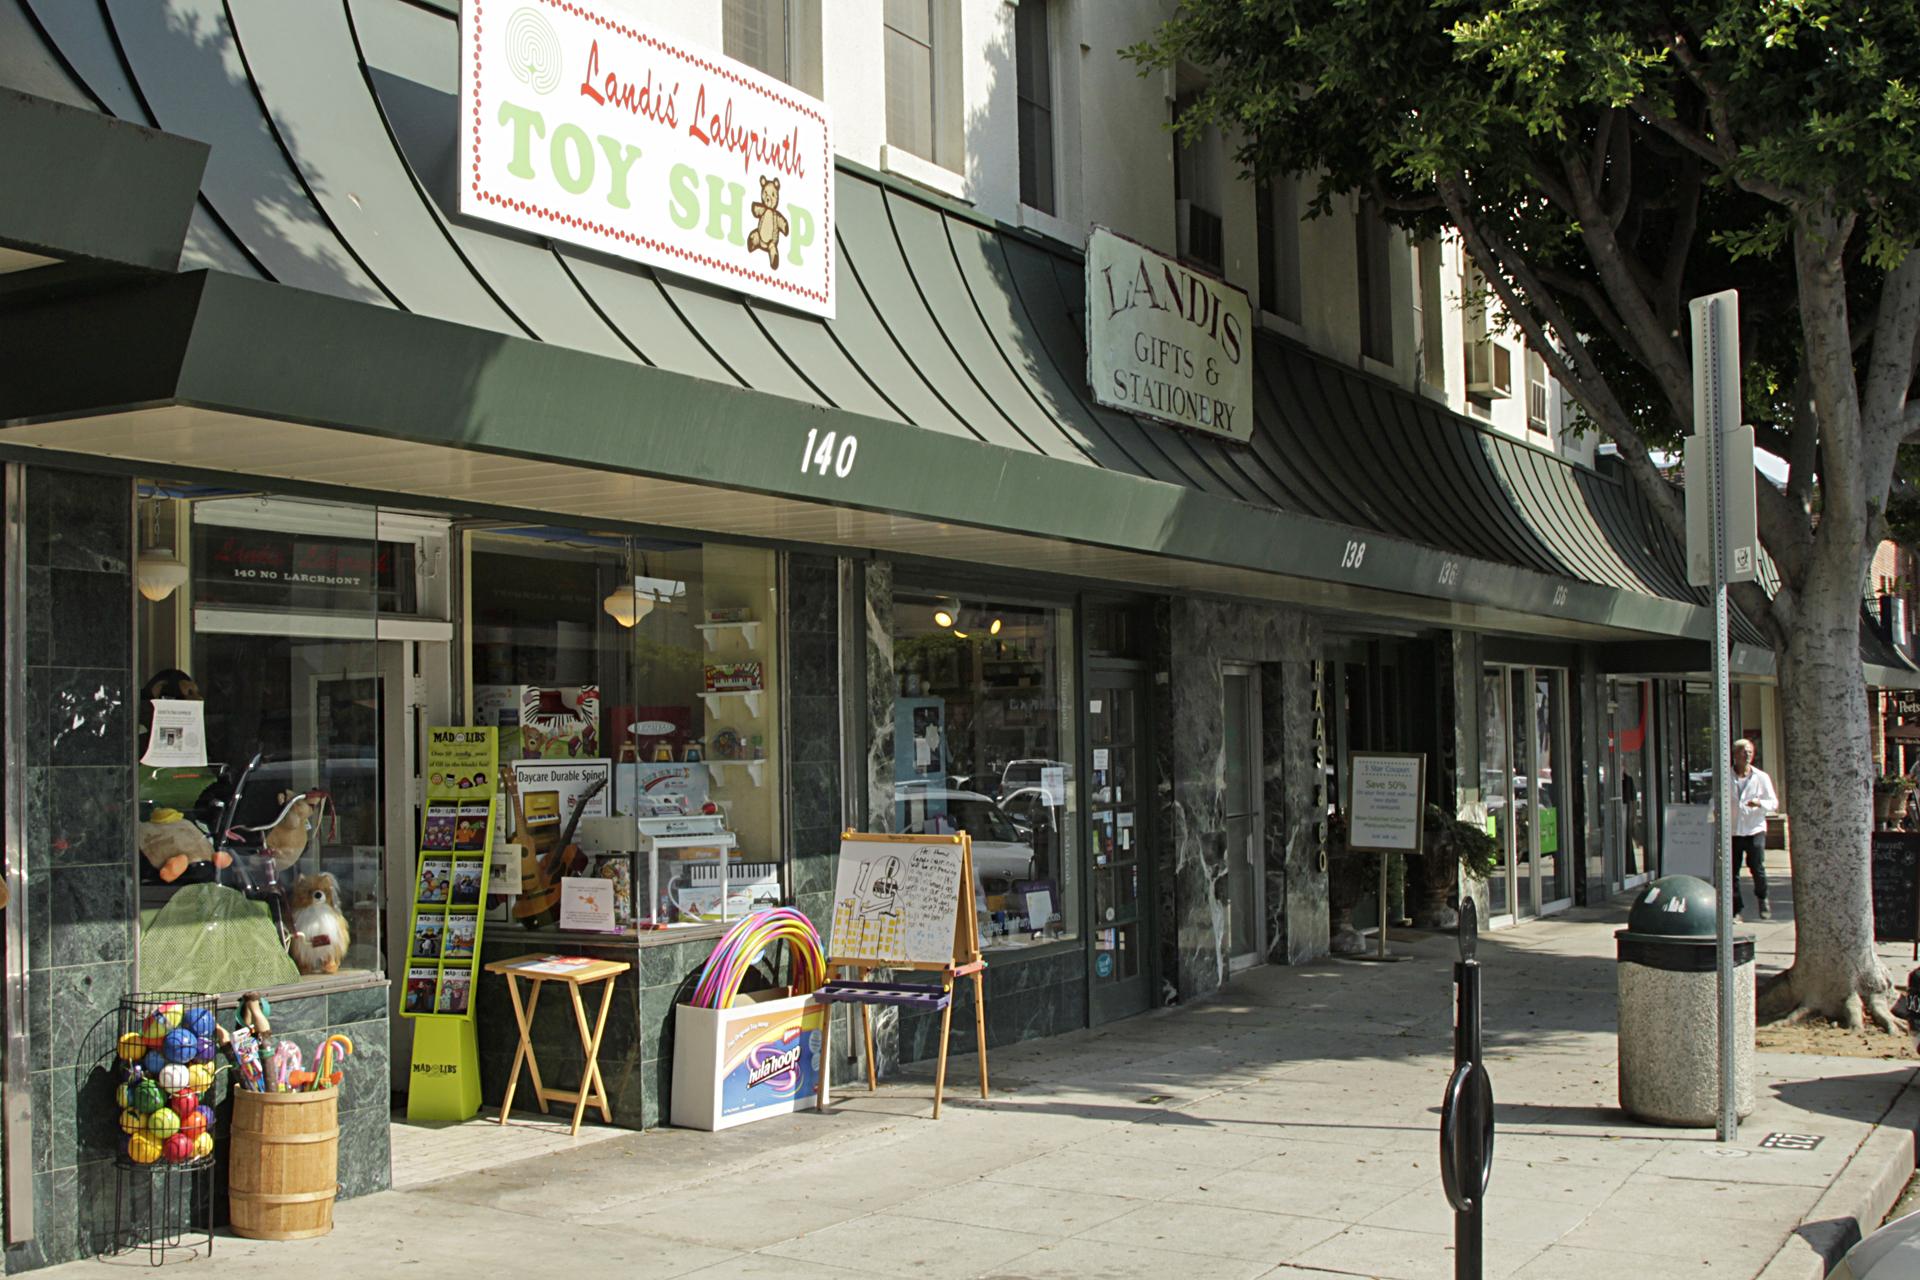 Landis-Shops-lrg.jpg